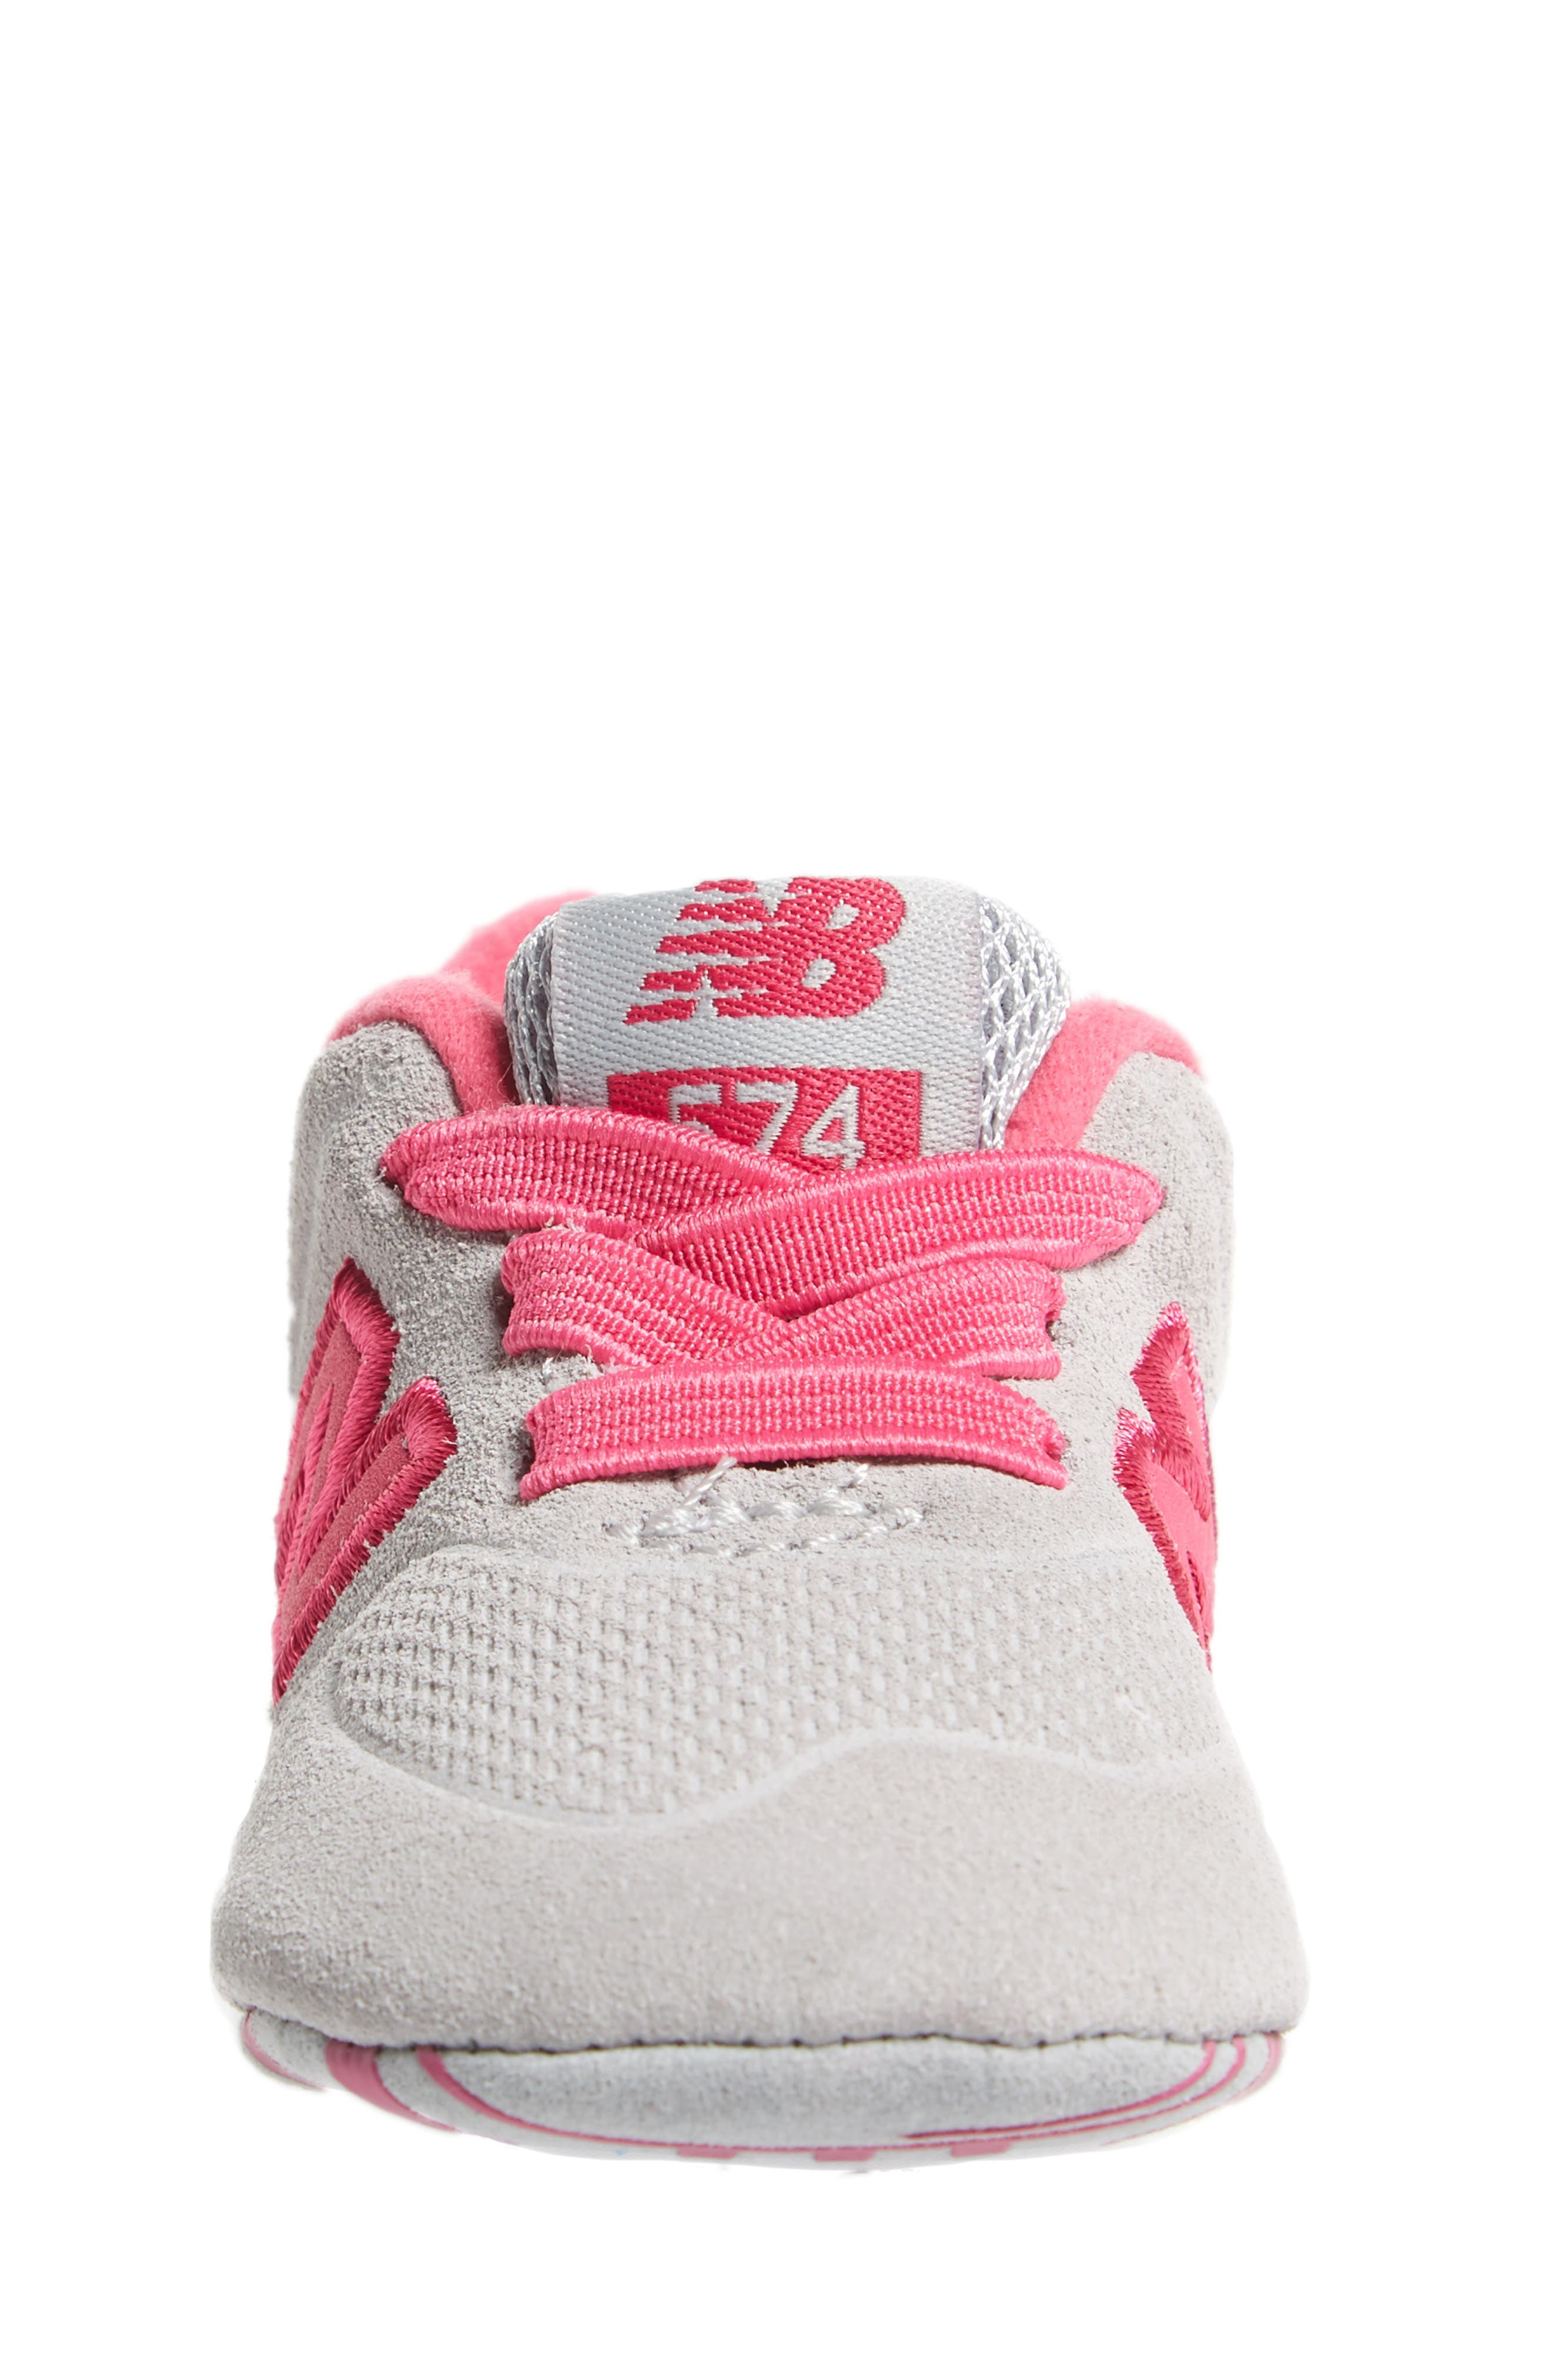 574 Crib Shoe,                             Alternate thumbnail 4, color,                             Pink/ Grey